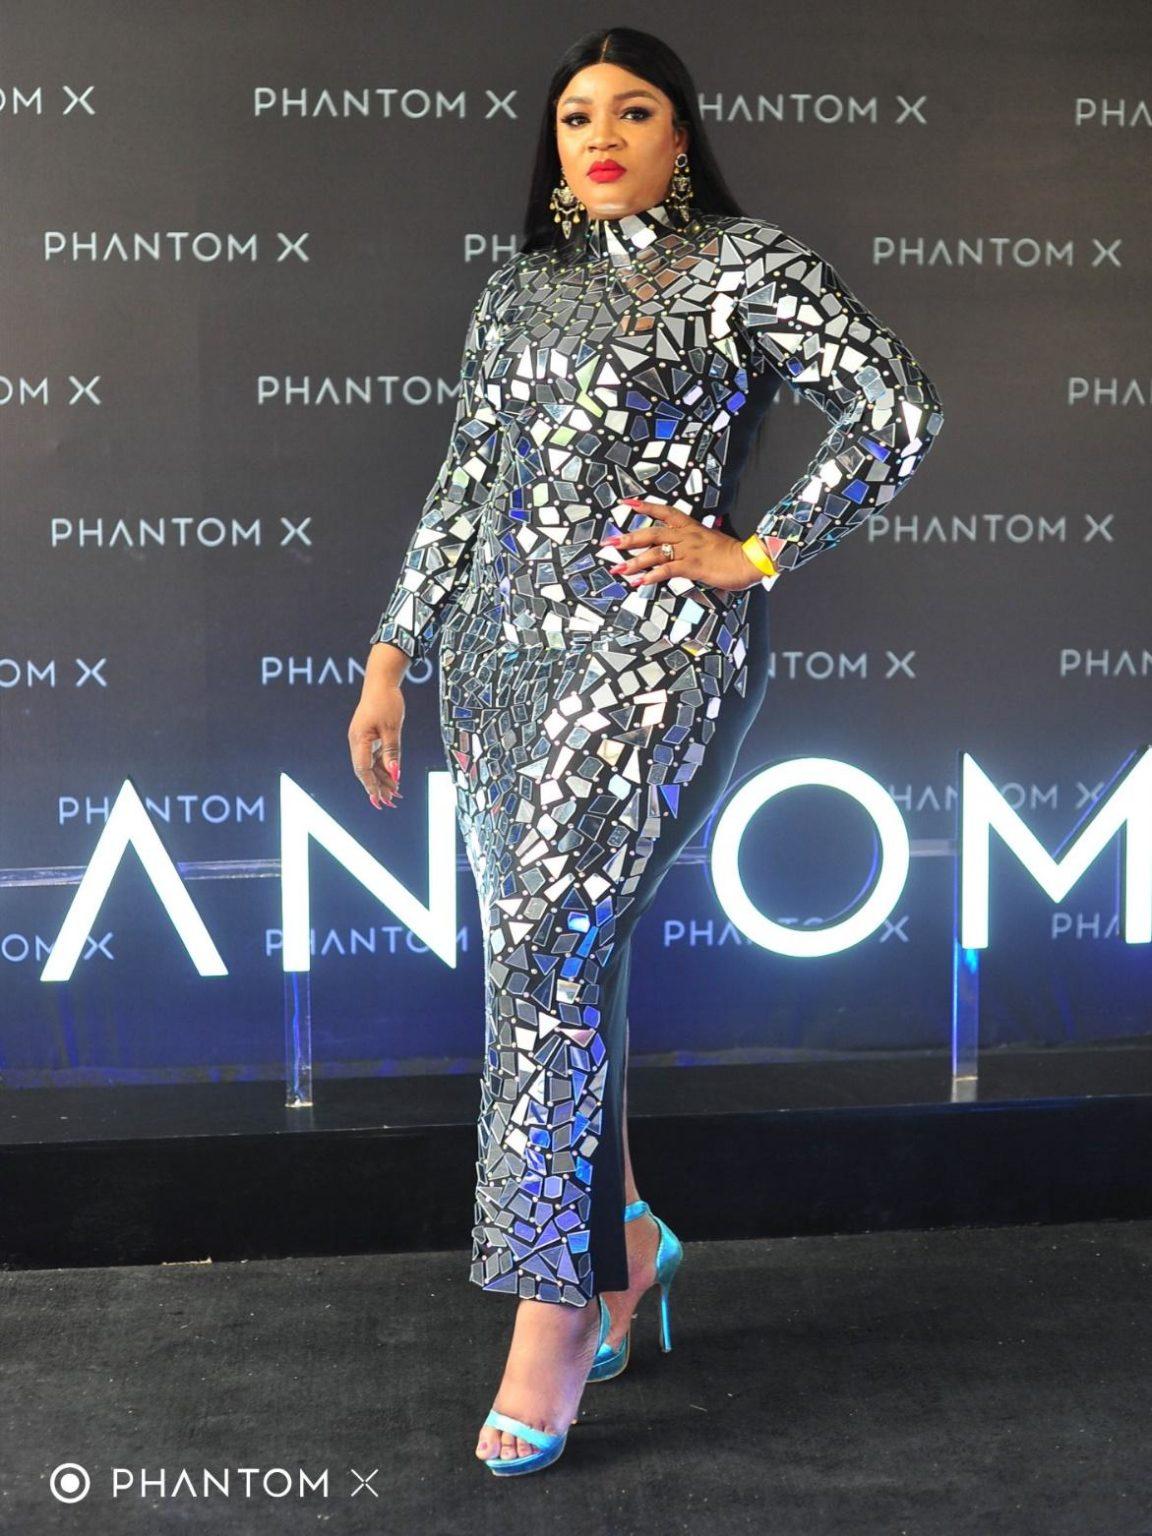 Phantom X launch 5 1152x1536 1